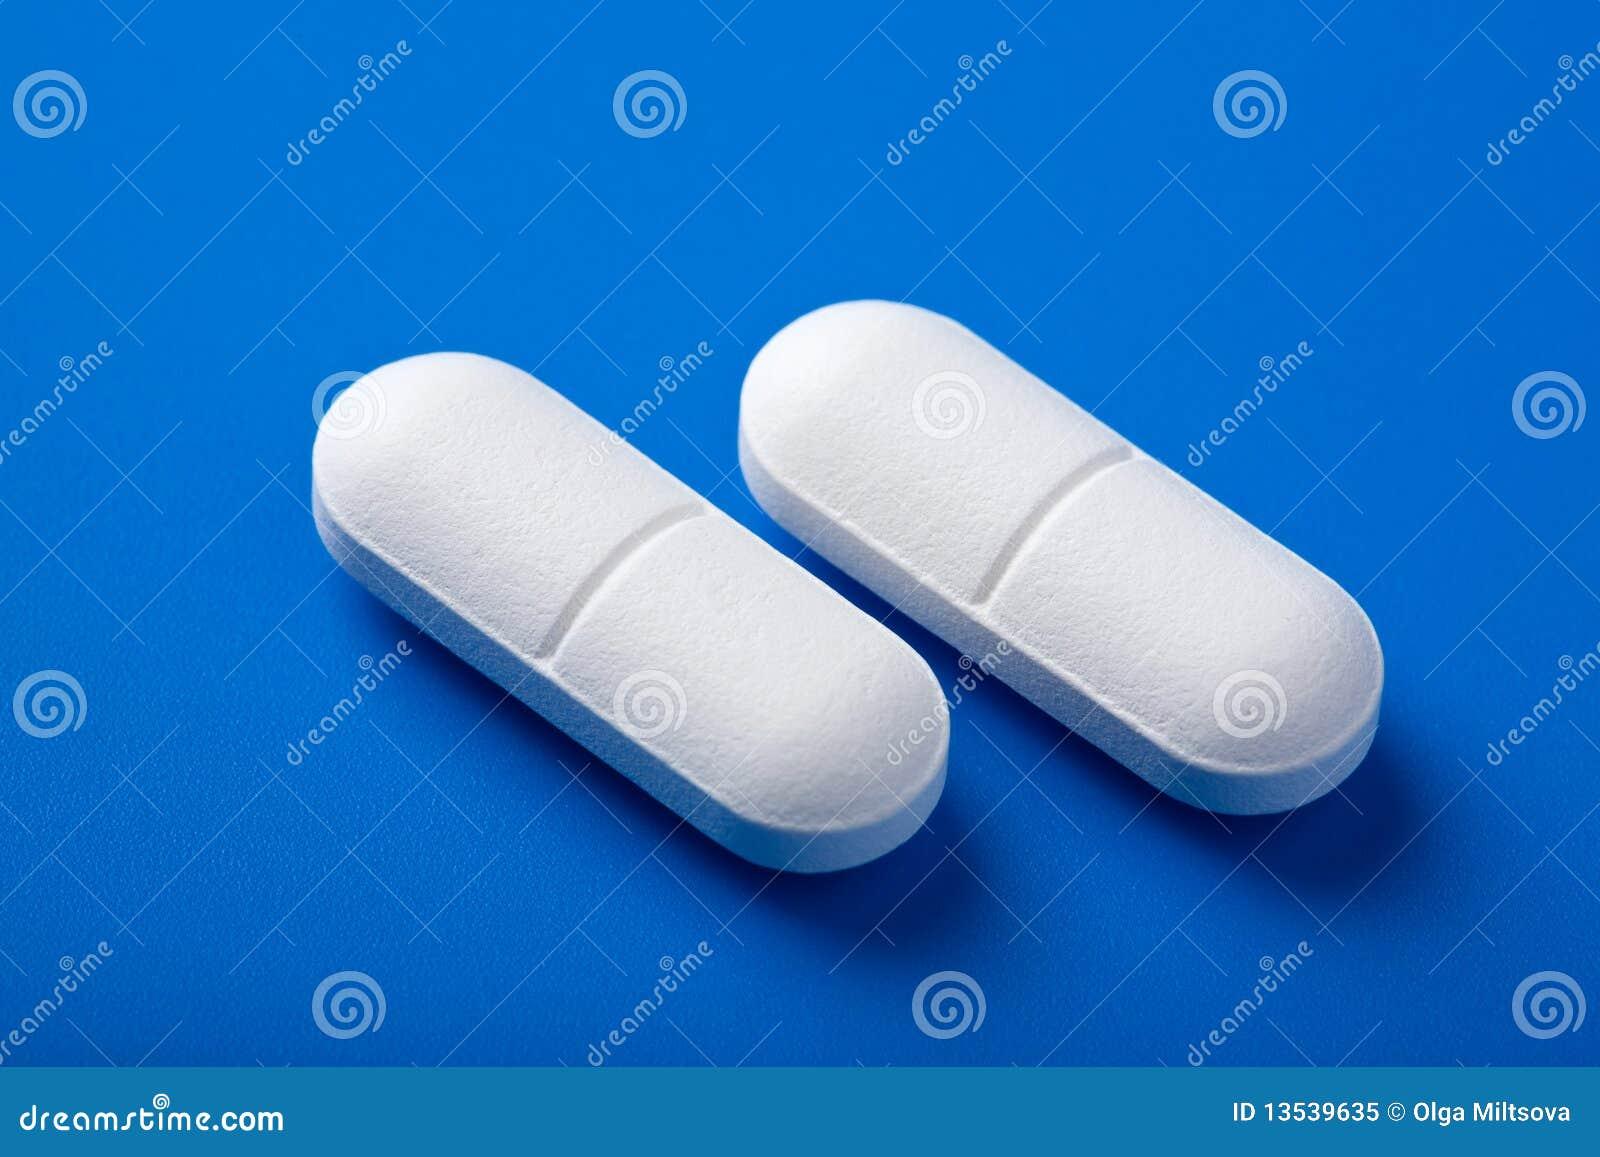 White Oblong Pill No Markings